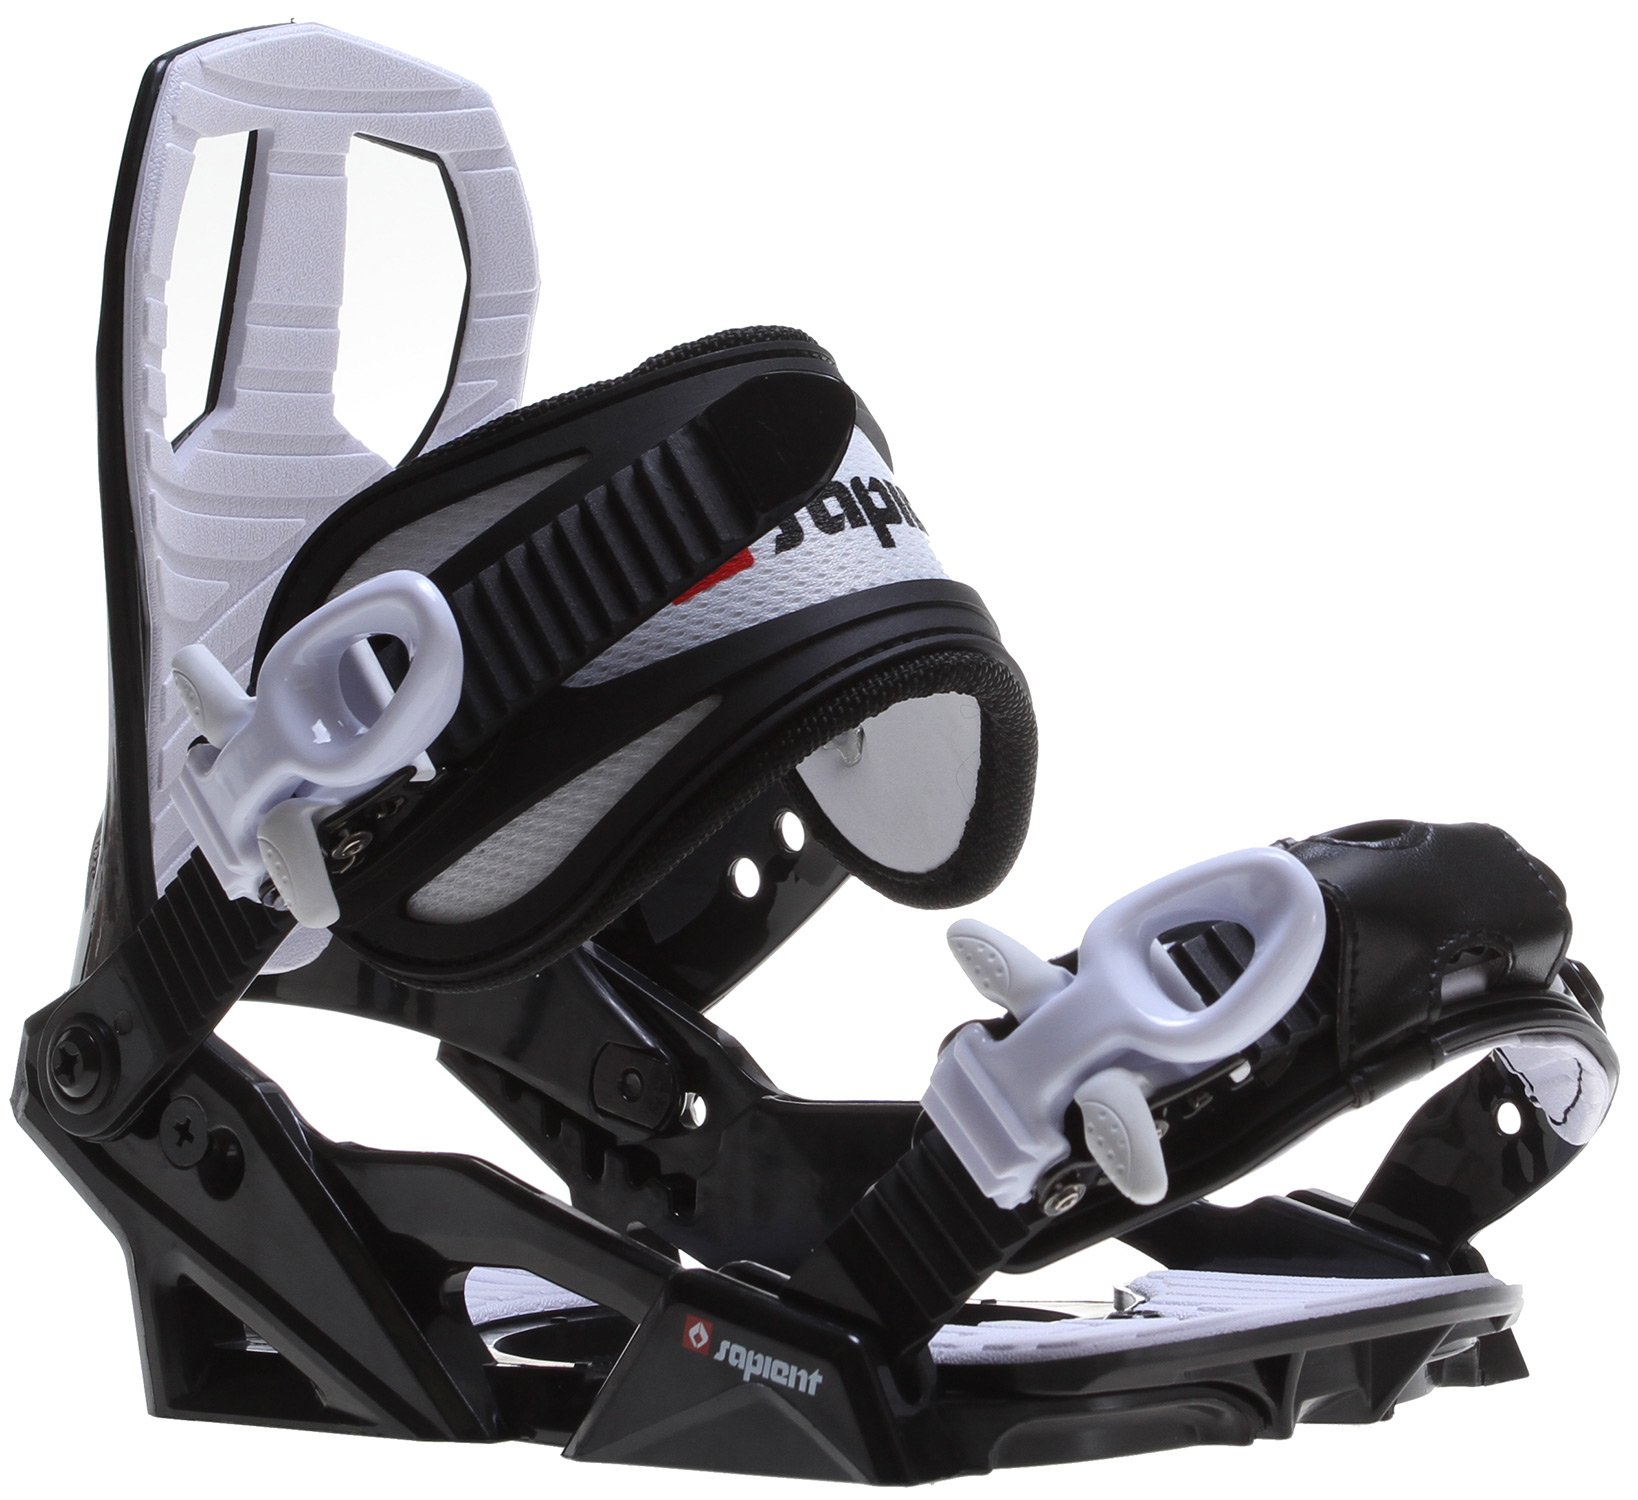 Sapient Zeus Jr Snowboard Bindings Black Sz S (4-7)